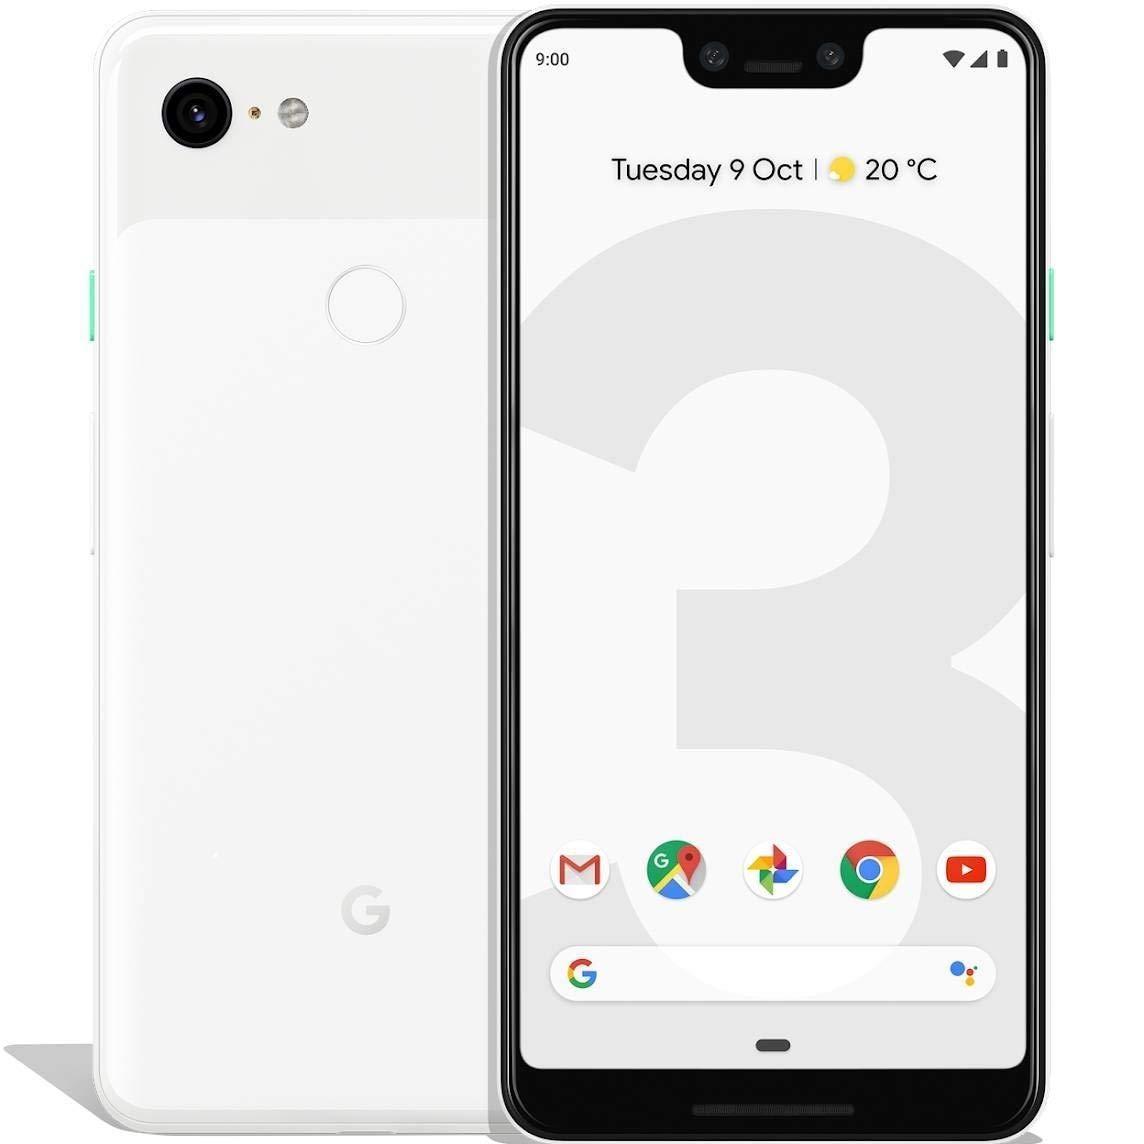 Google Pixel 3 XL, Band 4G/LTE/WiFi, внутренний 6 4 GB de Memoria, 4 GB Ram, экран высотой 16 cm (6,3 ), 3430 mAh, Pan